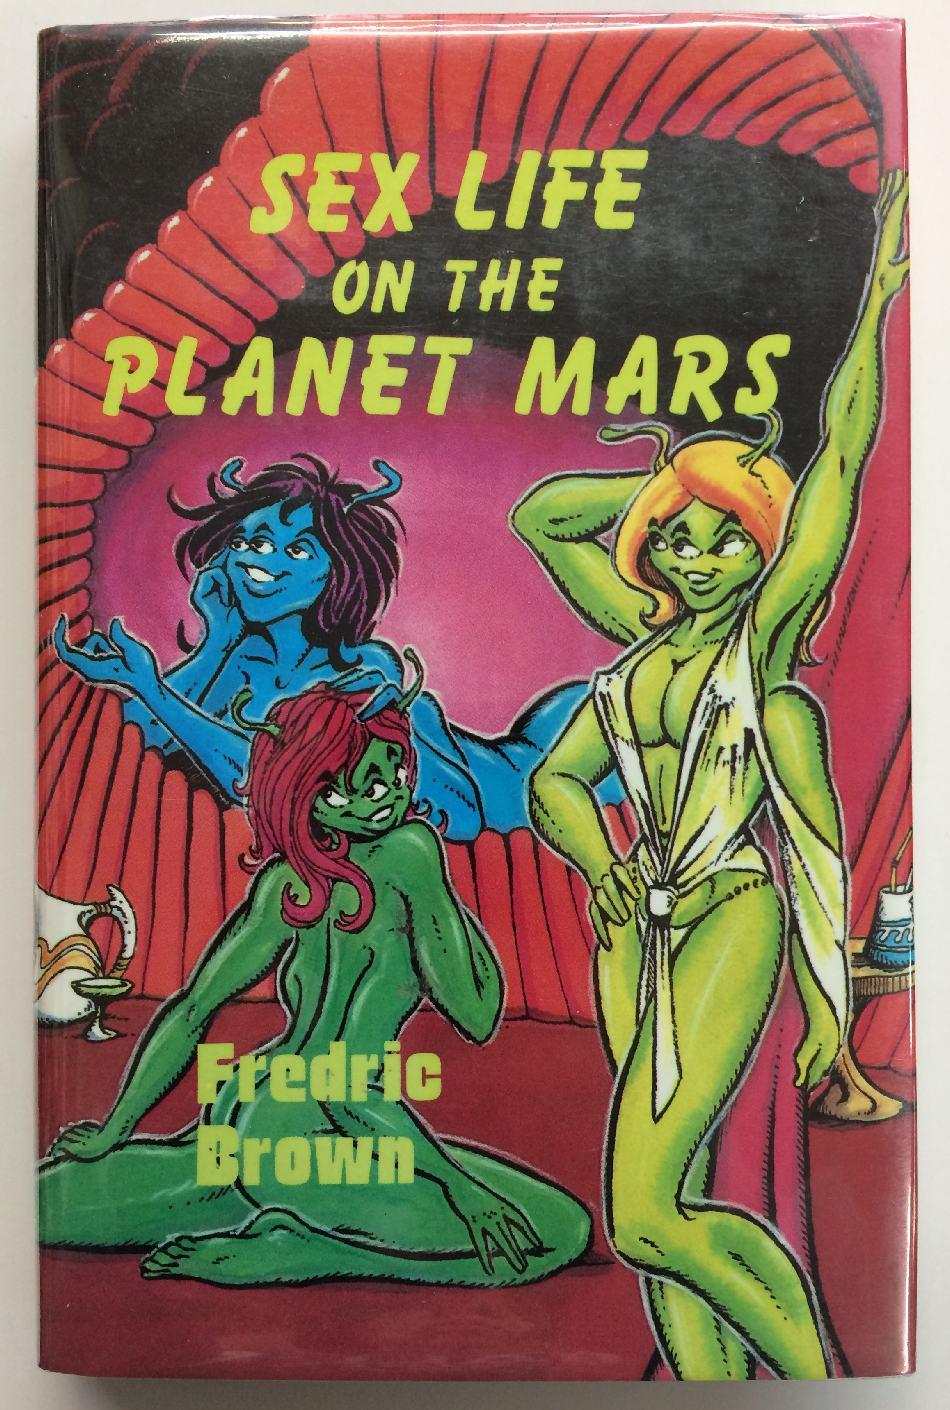 Puts the Martian in M.I.L.F.